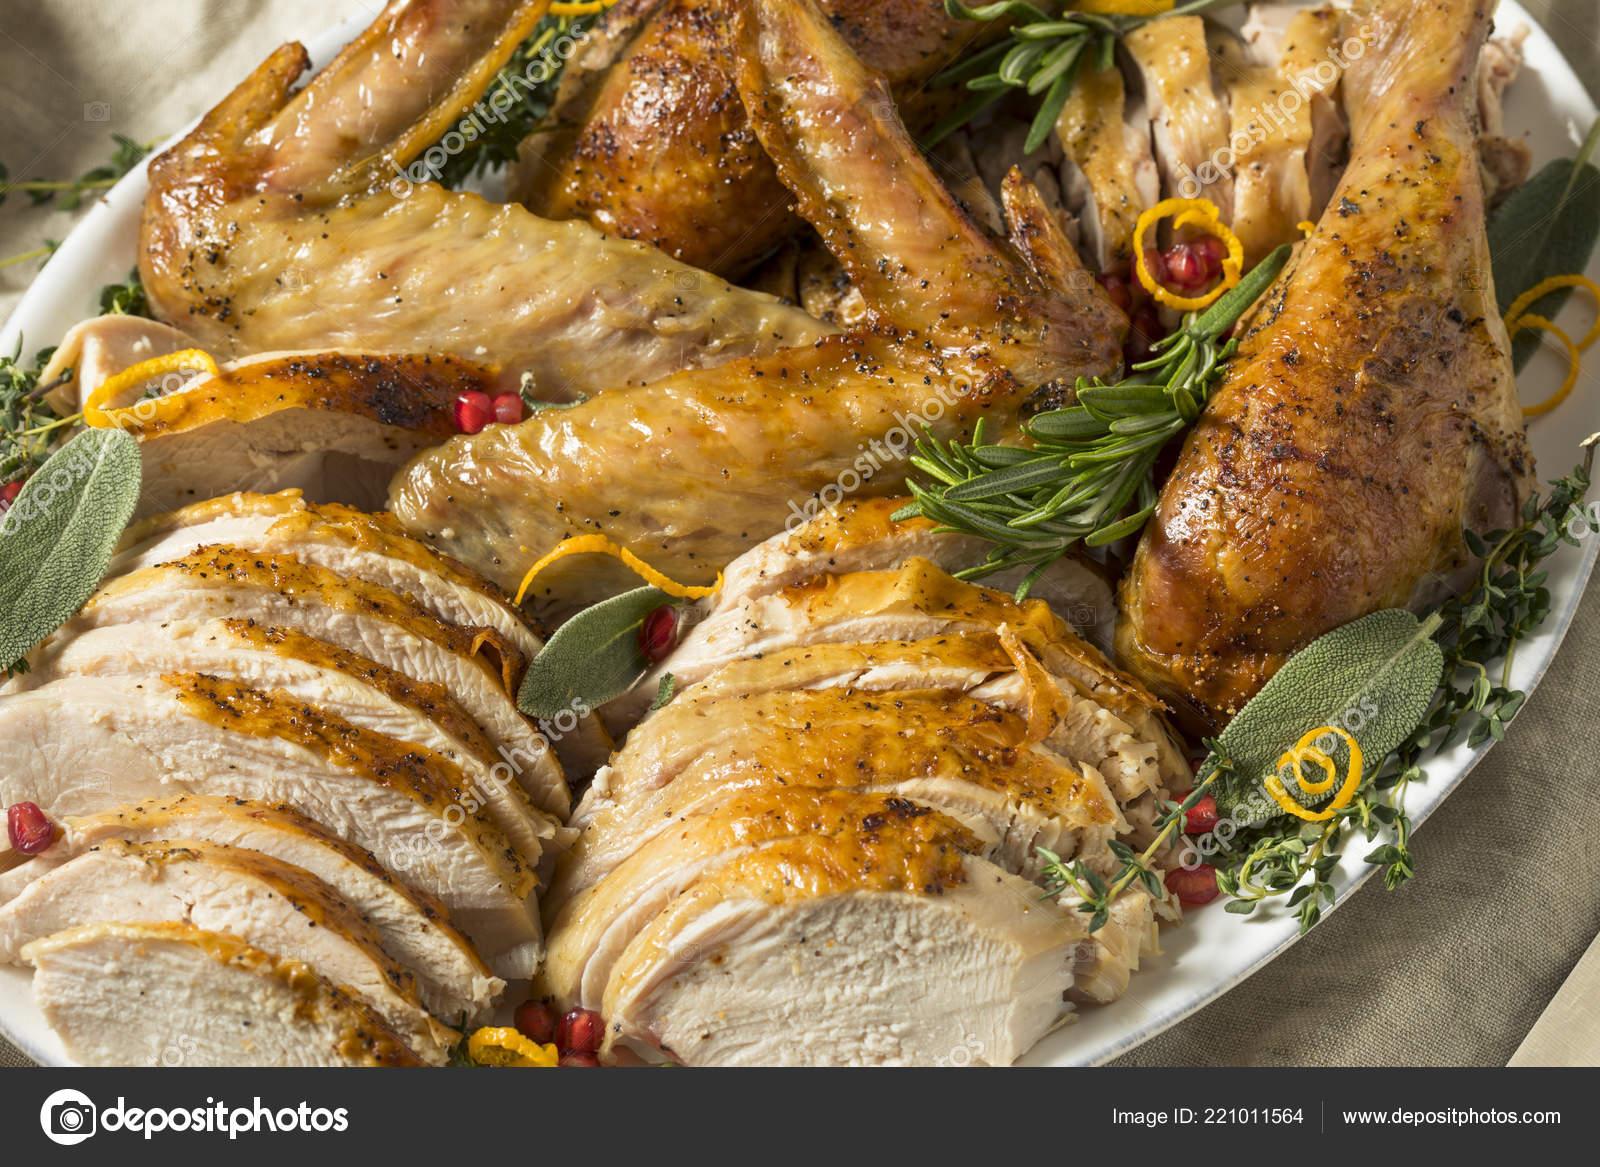 Roasted Cut Turkey Platter Thanksgiving All Sides Stock Photo